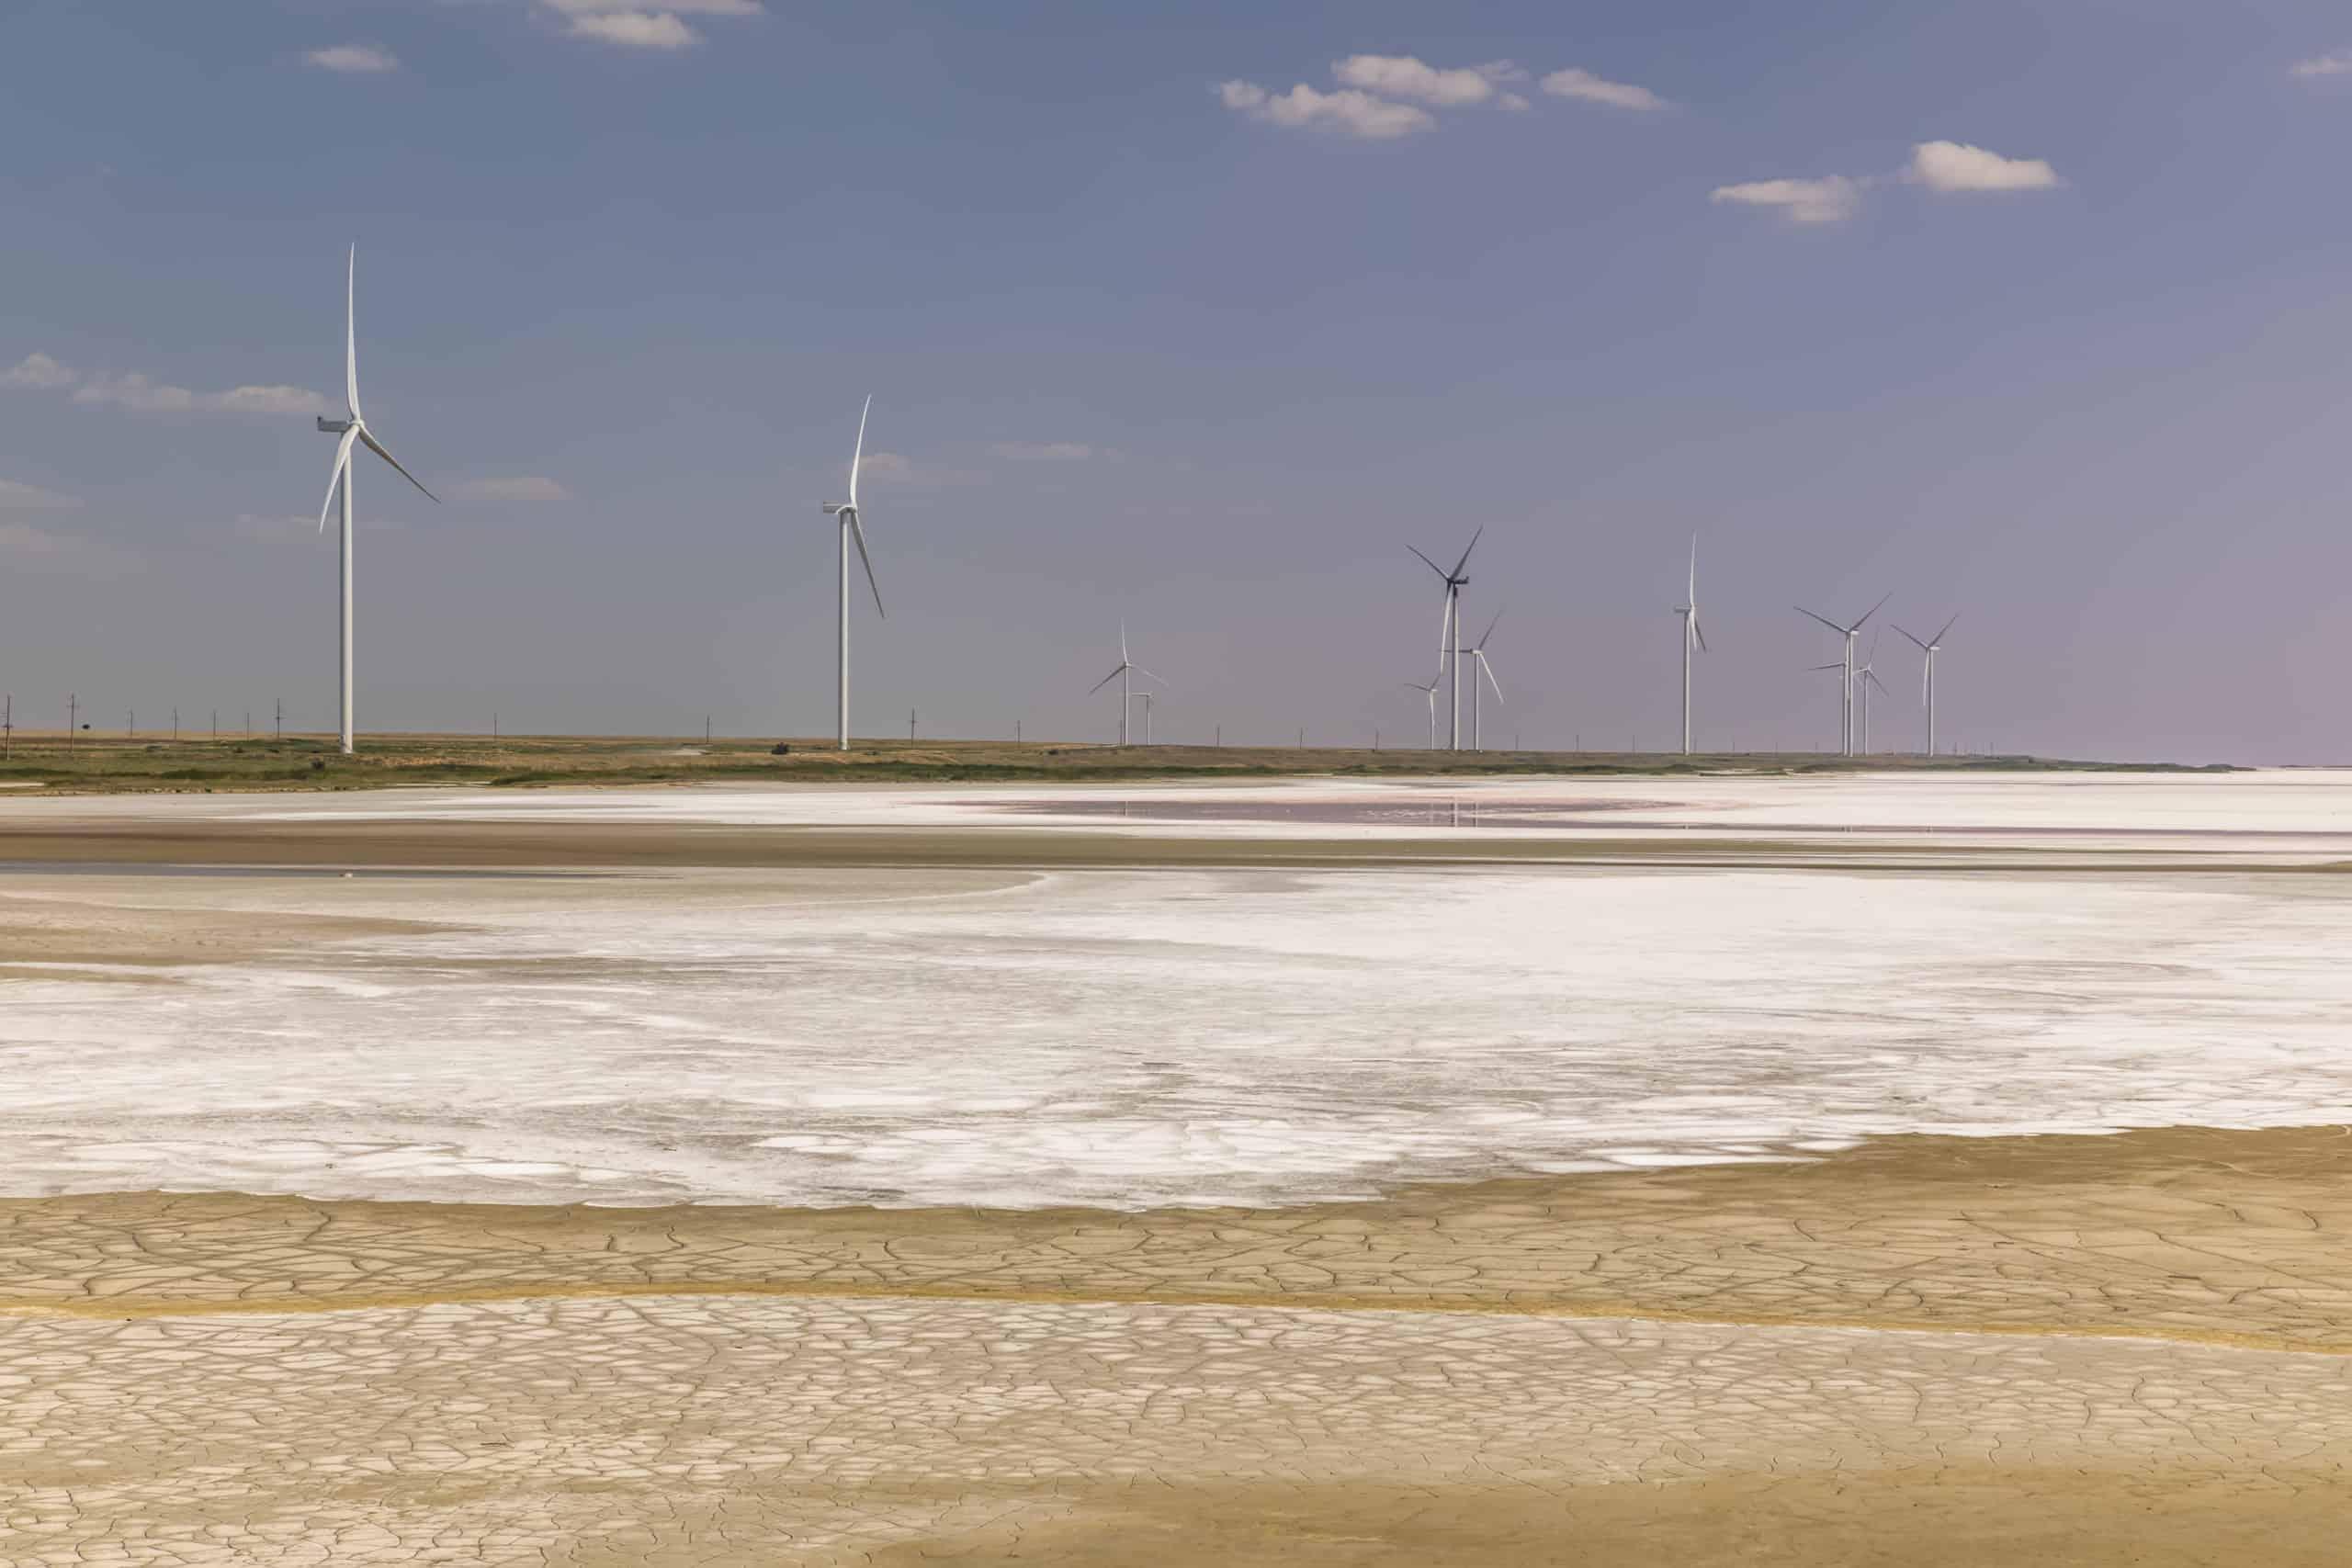 Wind turbines scaled